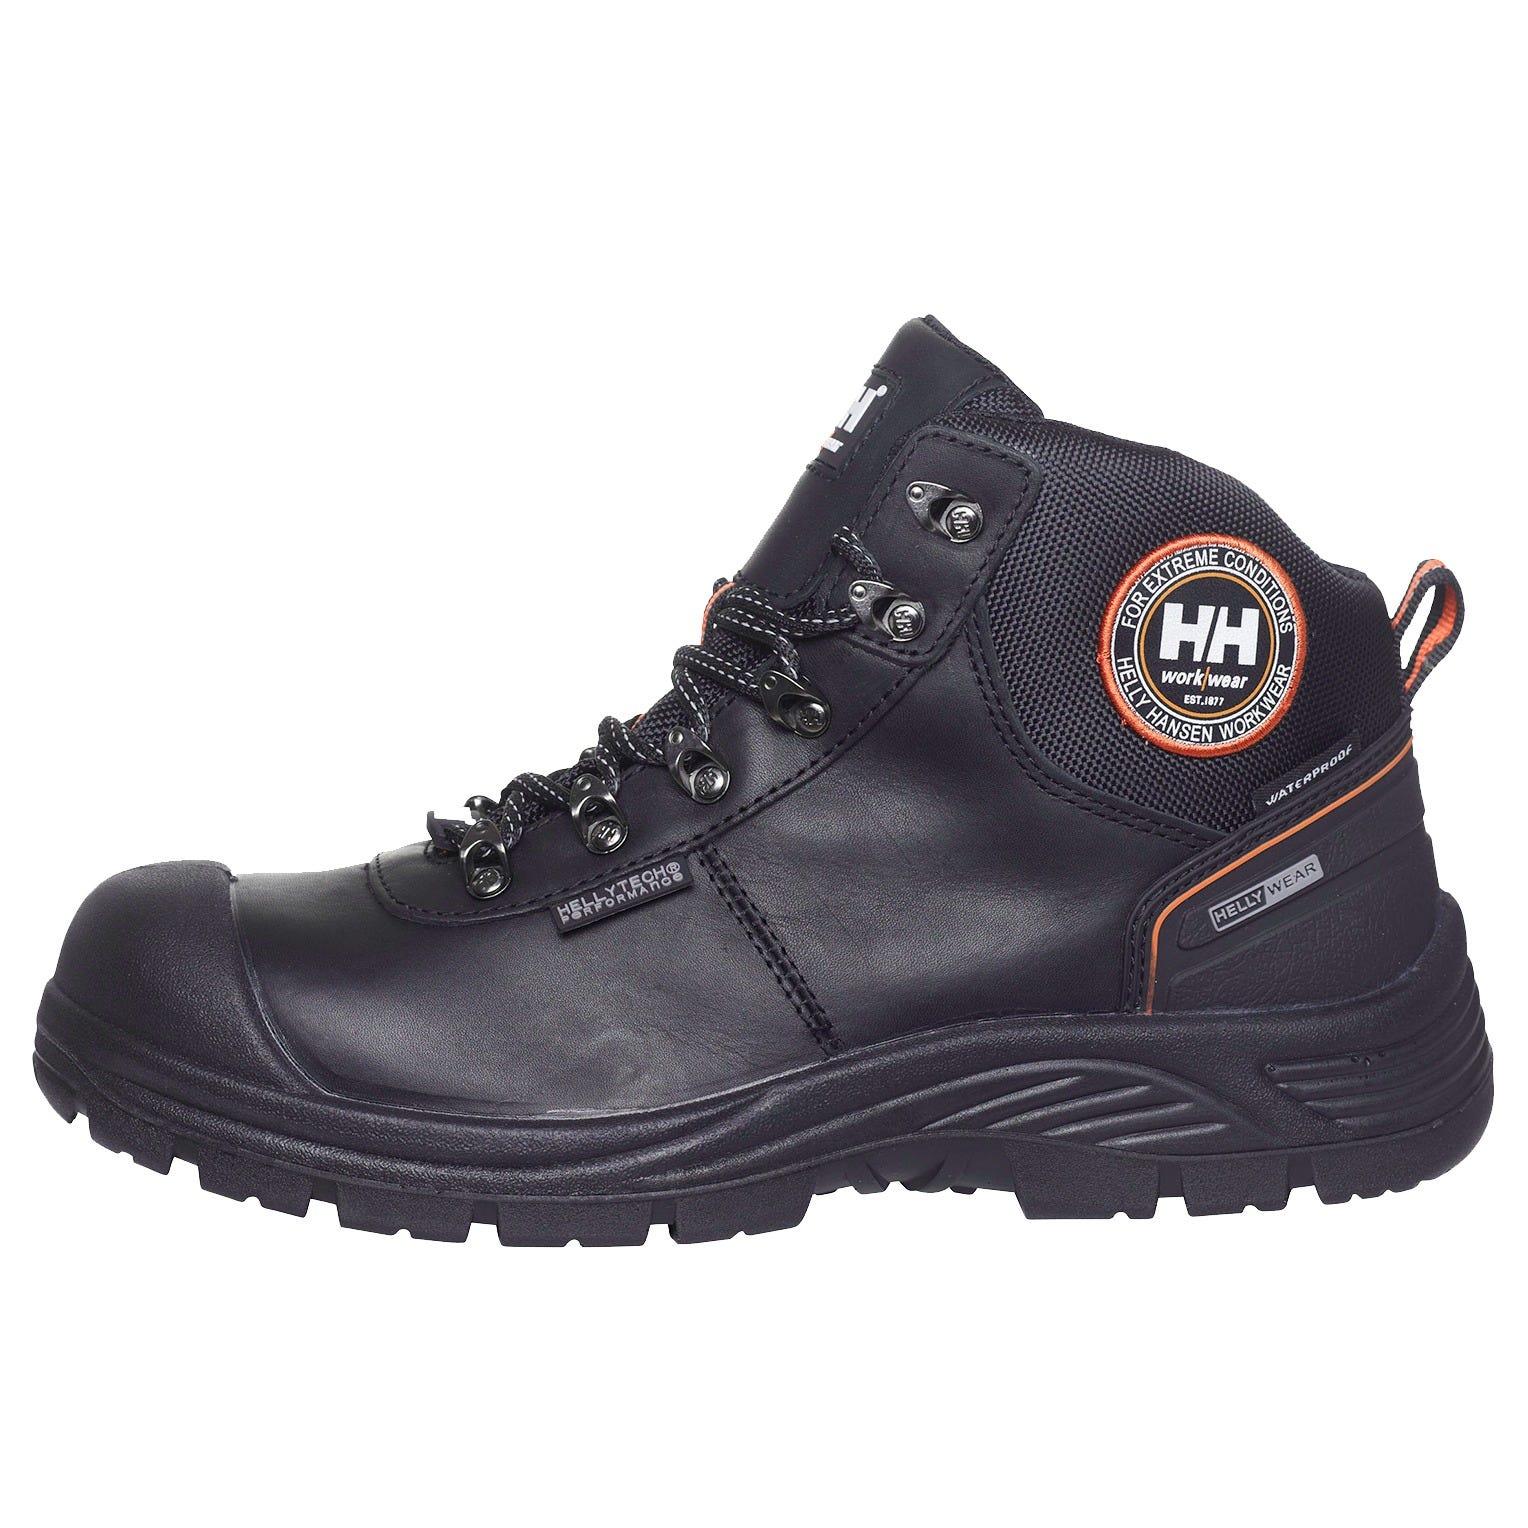 HH Workwear Workwear Helly Hansen Scarpa Mid Antinfortunistica Chelsea Certificata S3 Impermeabile Con Punta In Materiale Composito 44 Nero